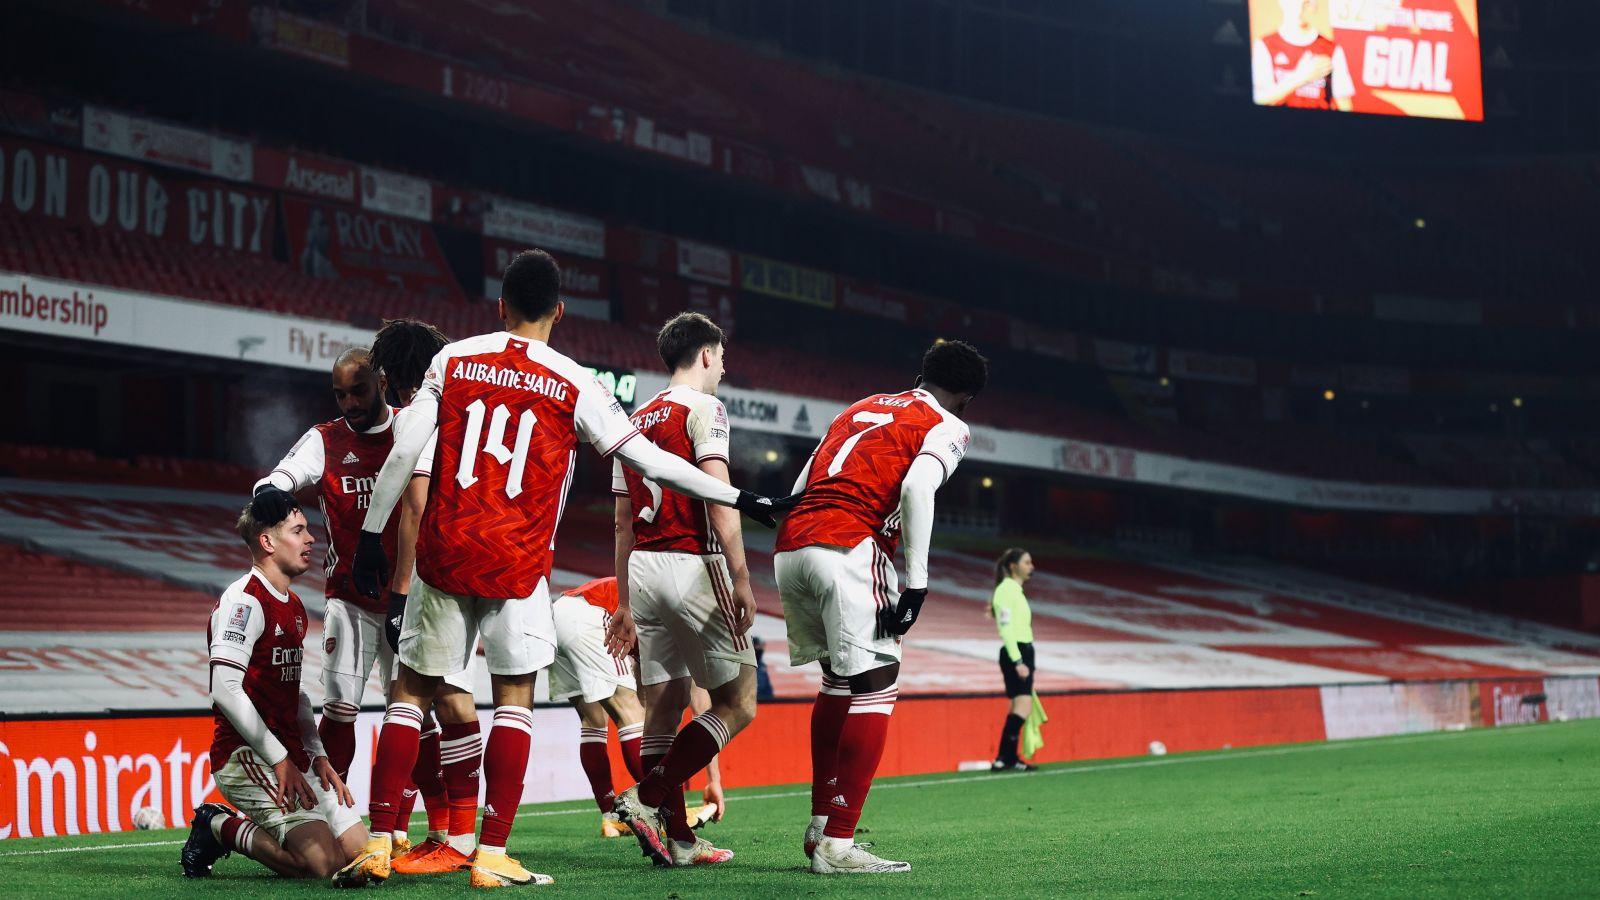 Skuad Arsenal. (foto: twitter.com/Arsenal)